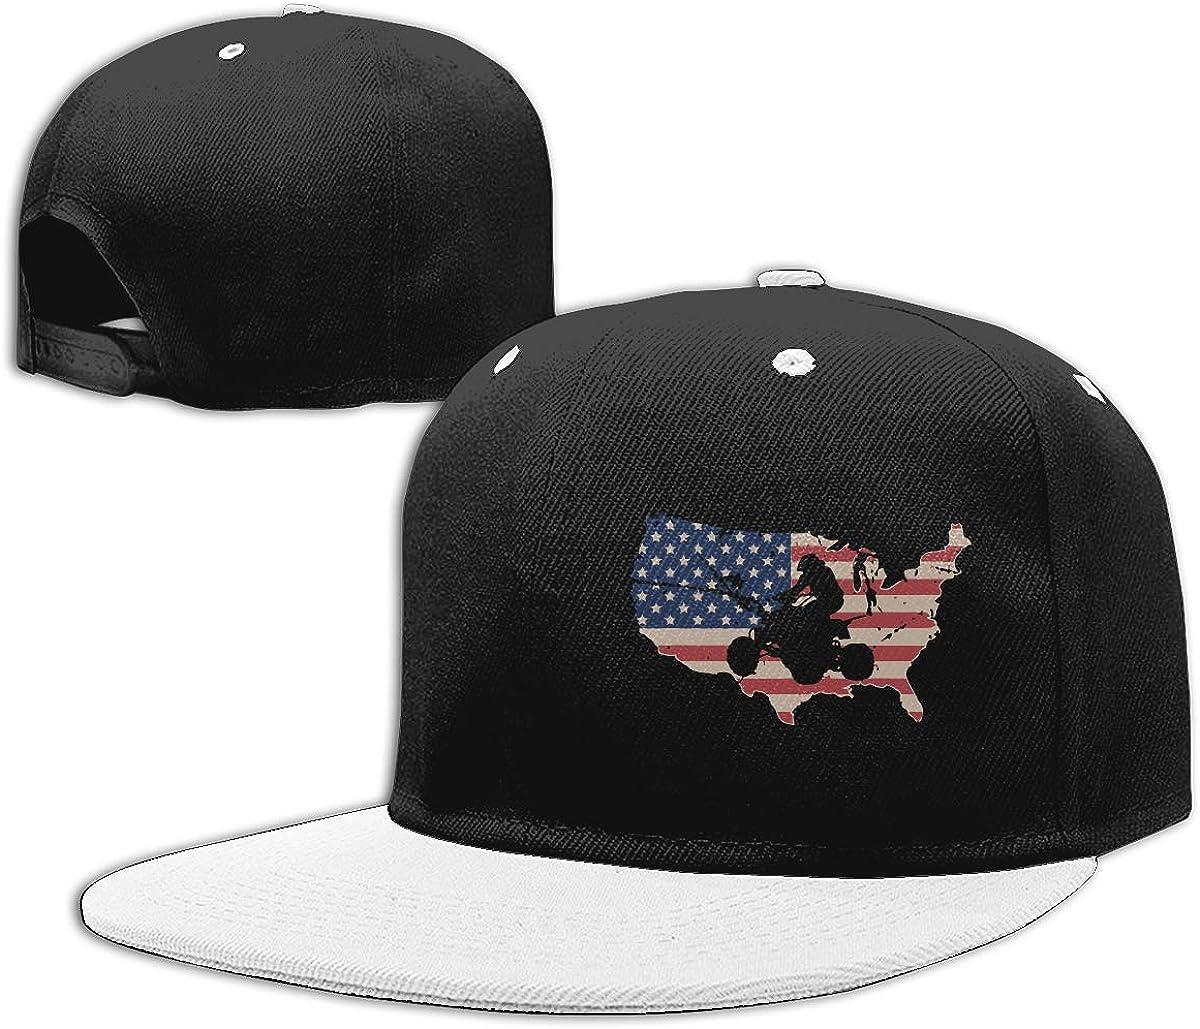 NMG-01 Women Men Trucker Cap ATV Quad USA Flag Printed Hip Hop Baseball Caps